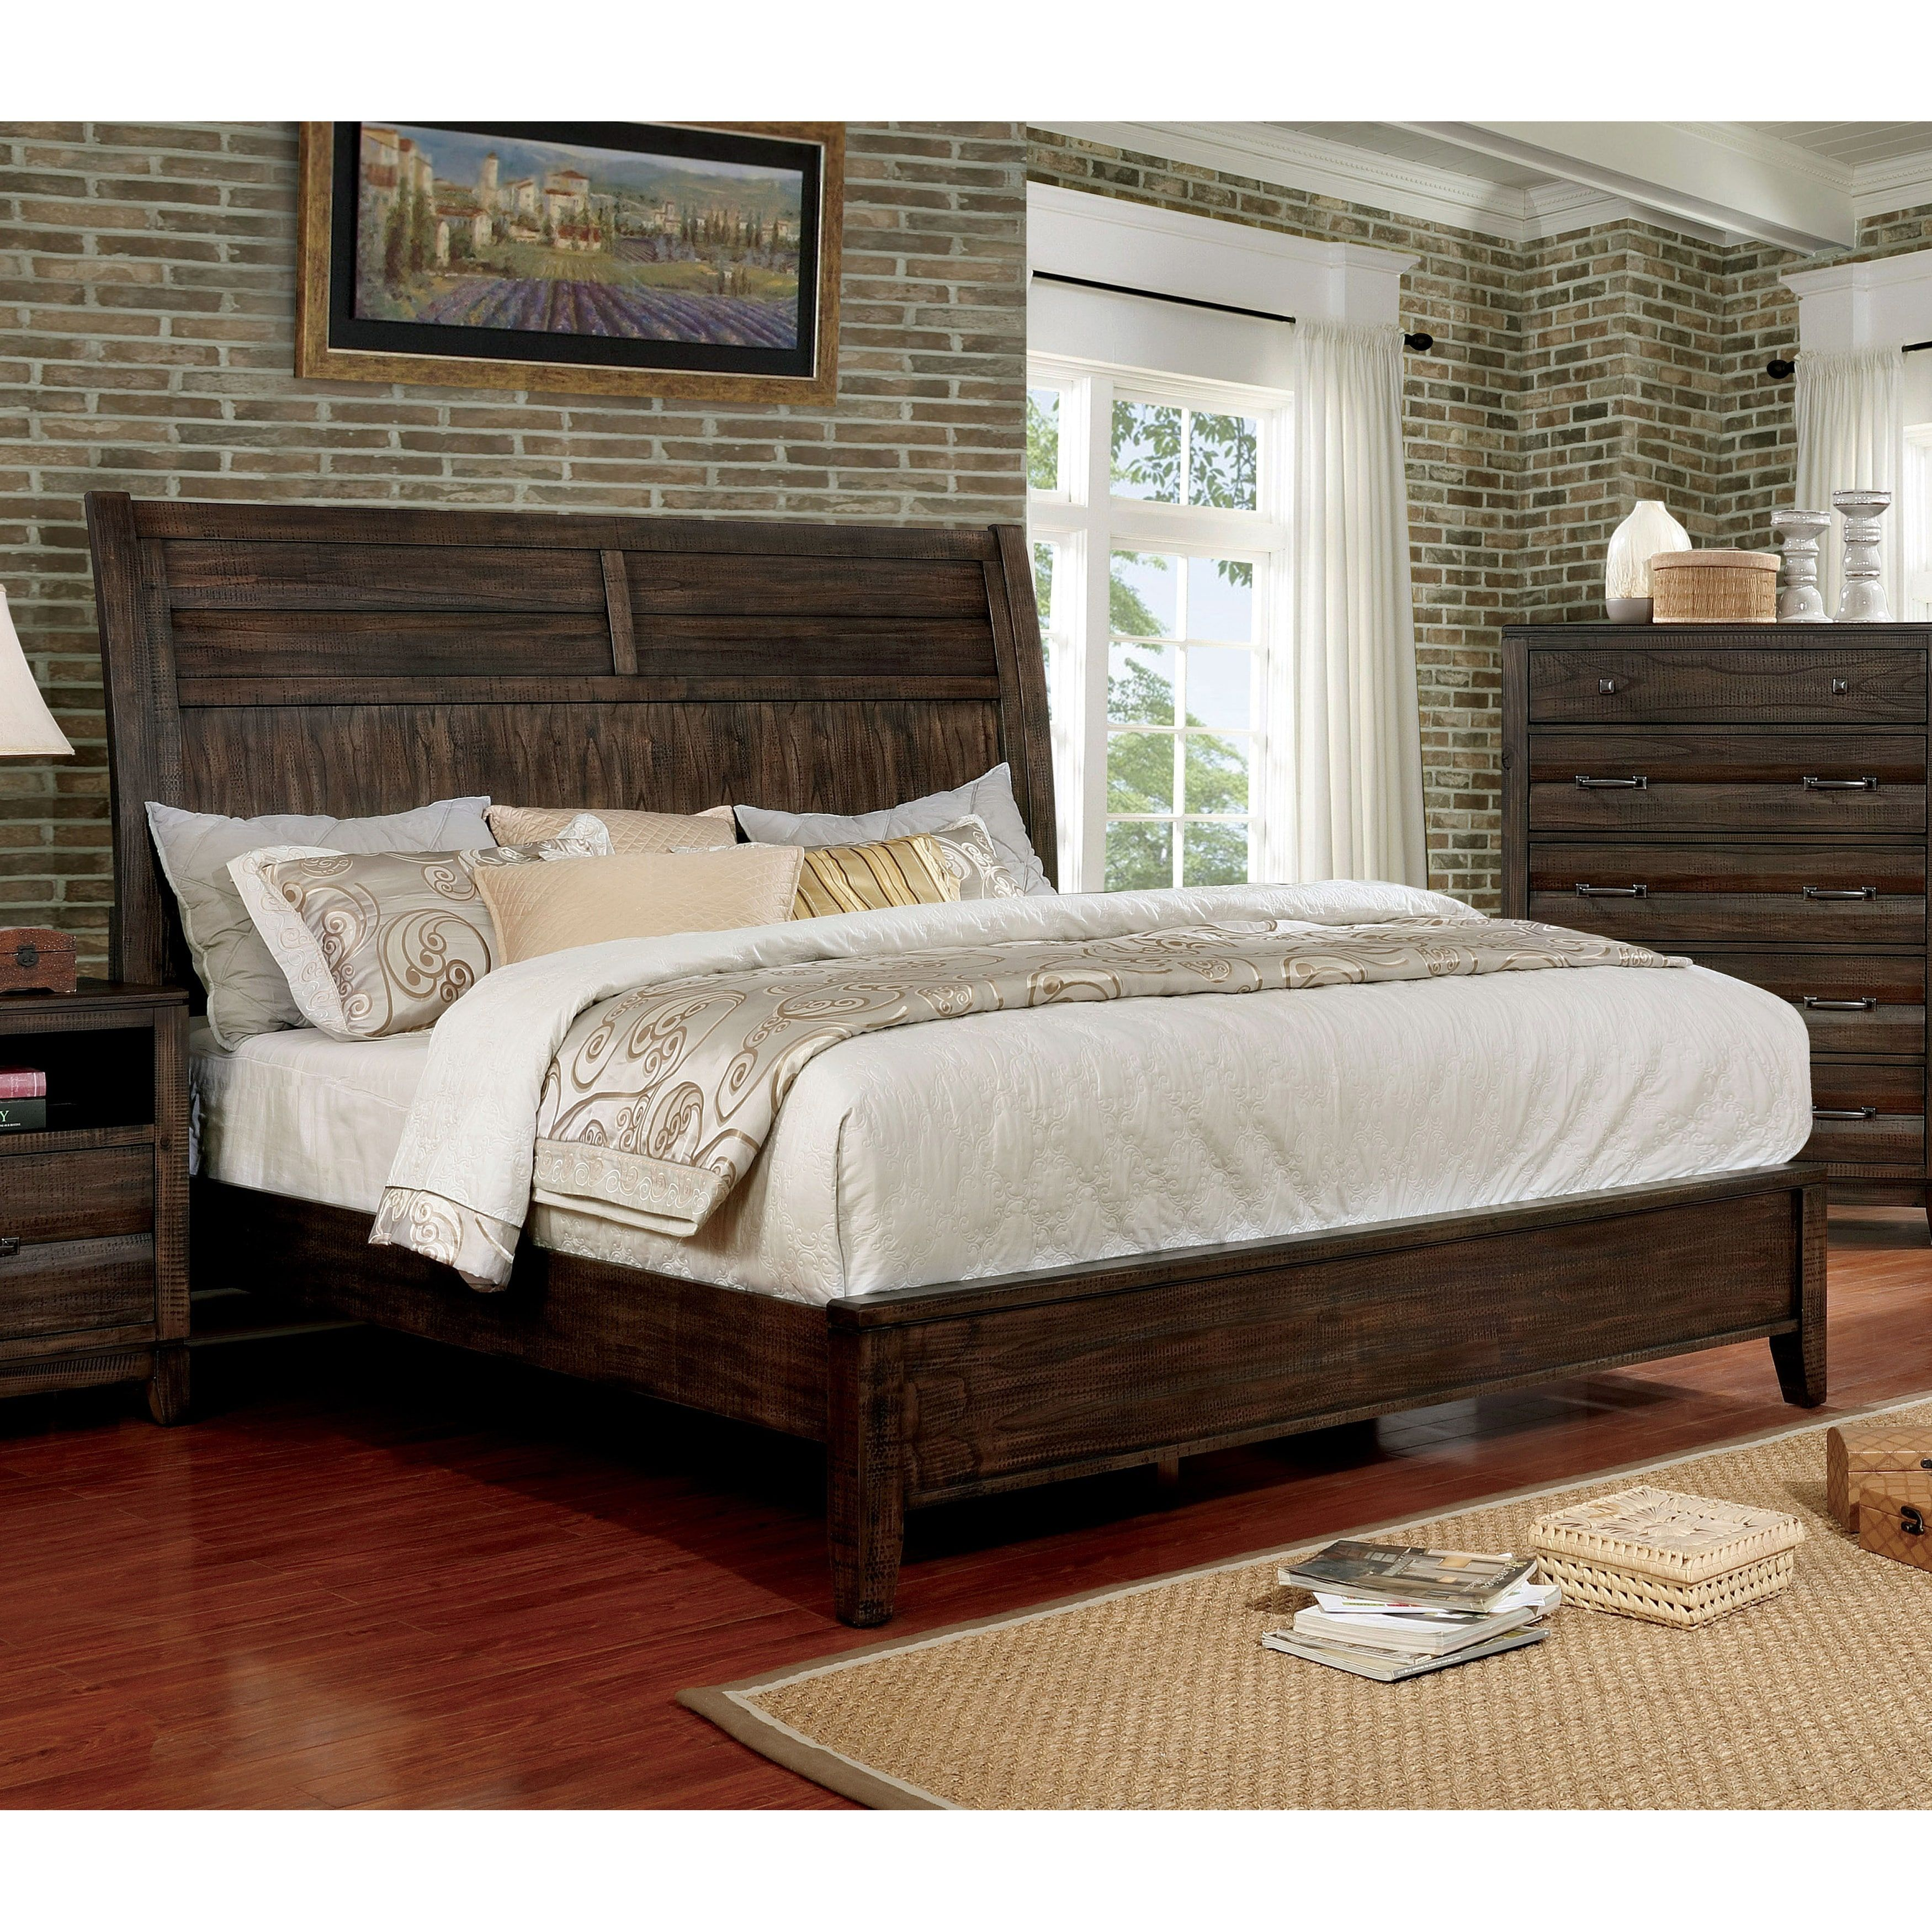 Furniture of America Cekel Rustic Contemporary Walnut Finish Wooden ...